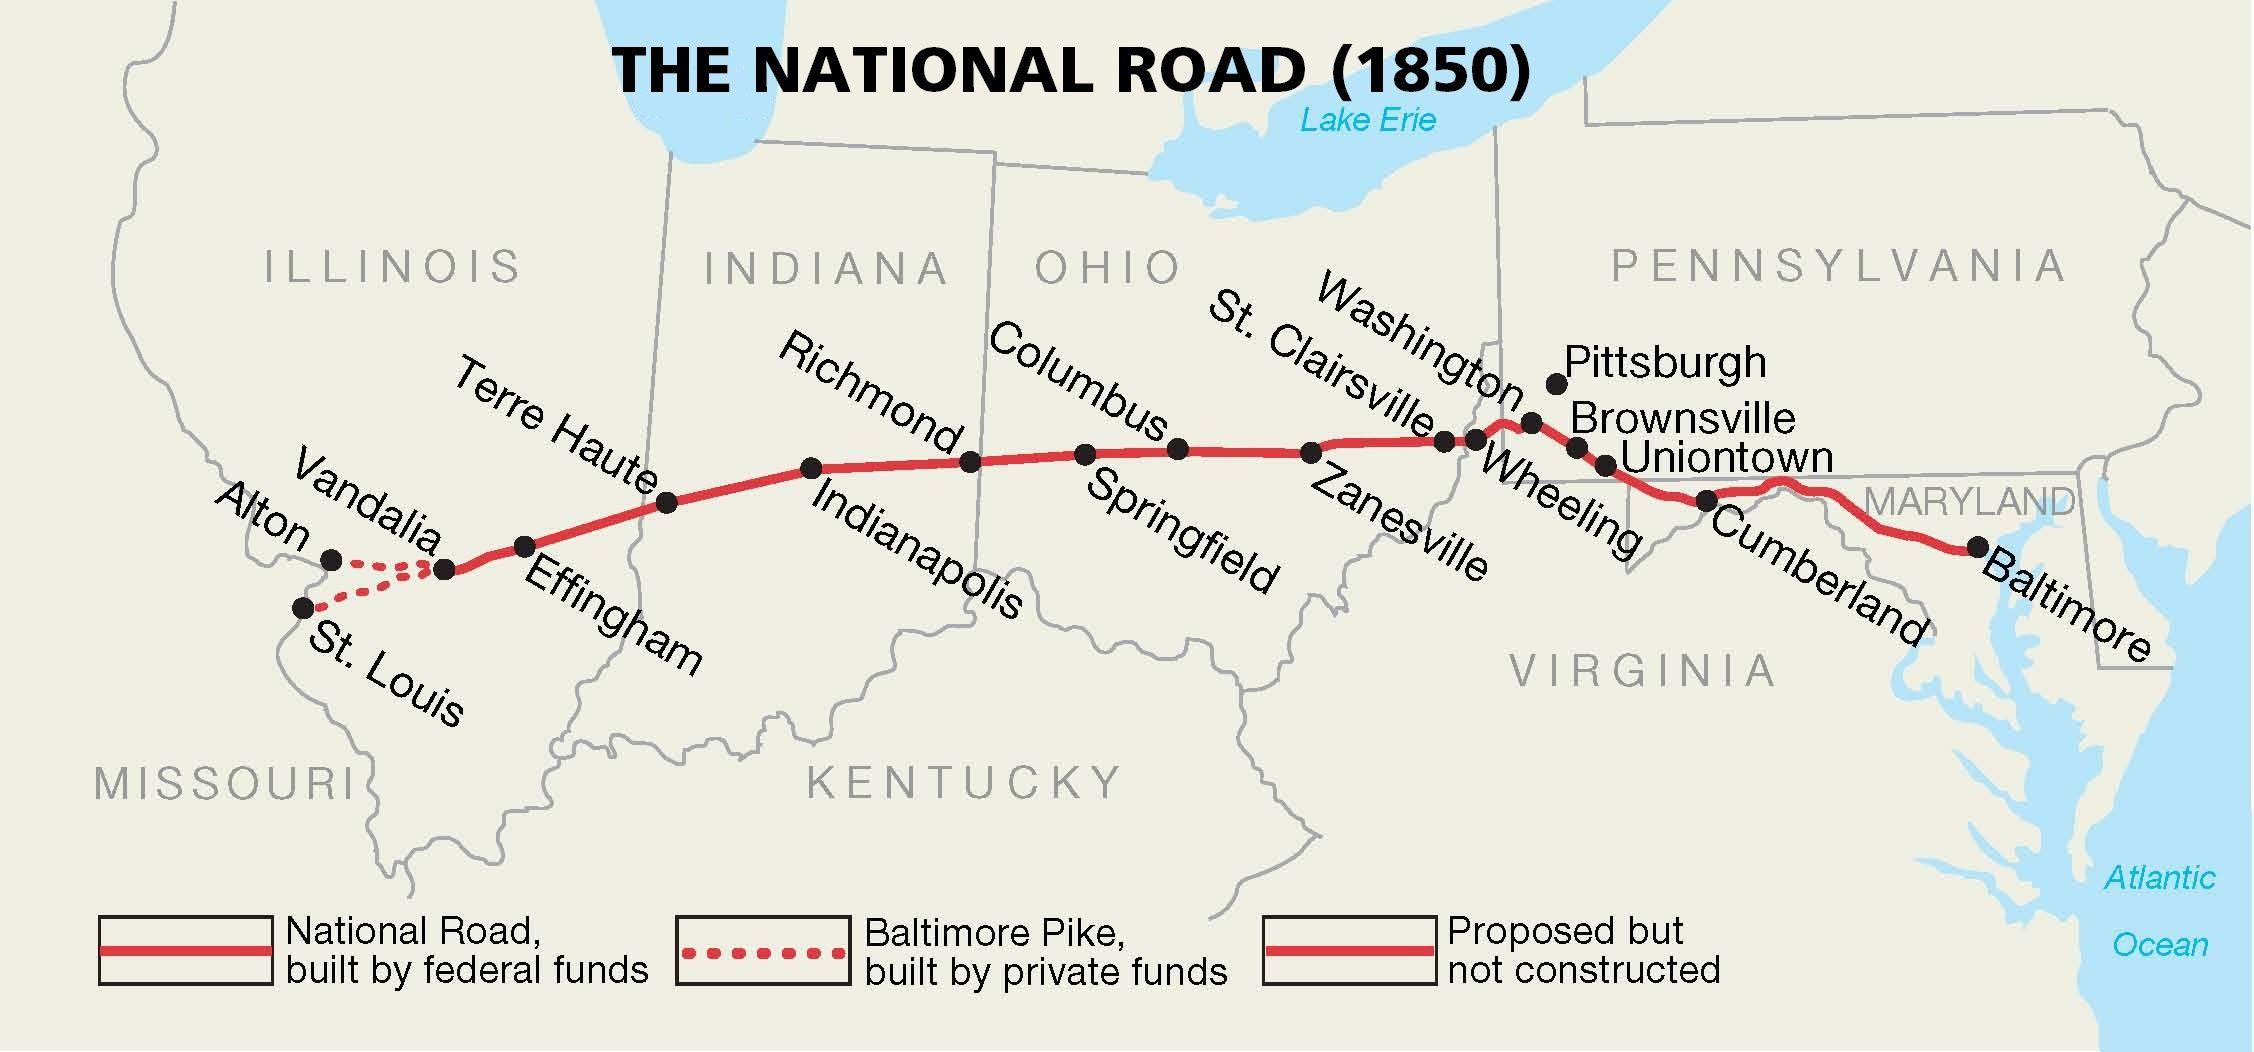 Road Map Of IllinoisIllinois Road Map Digital Illinois Road Map - Maryland map usa